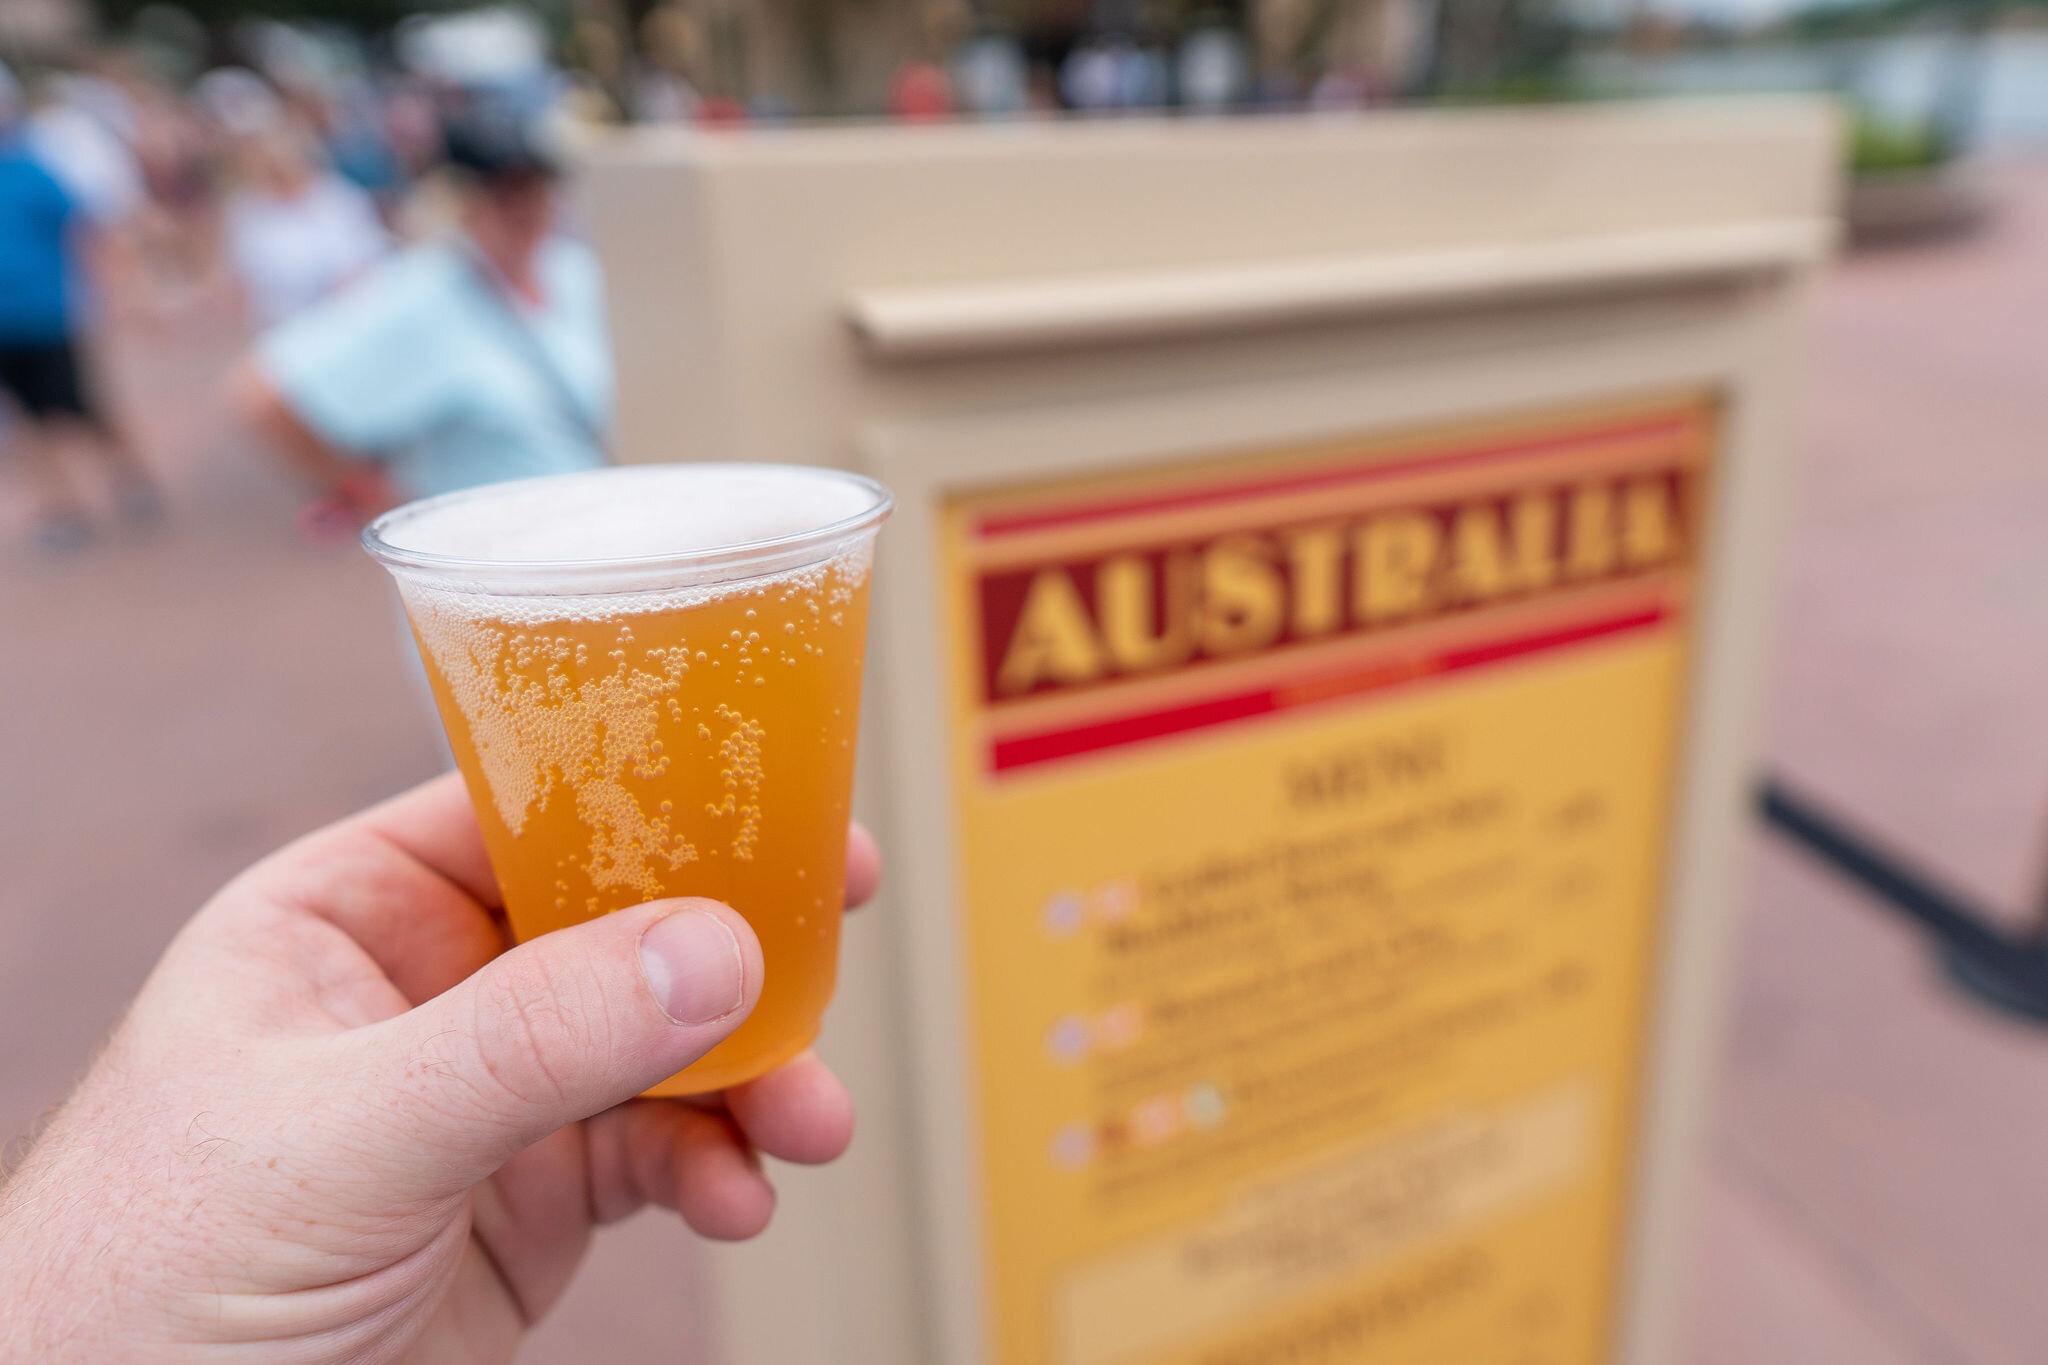 Australia: Coopers Brewery Original Pale Ale